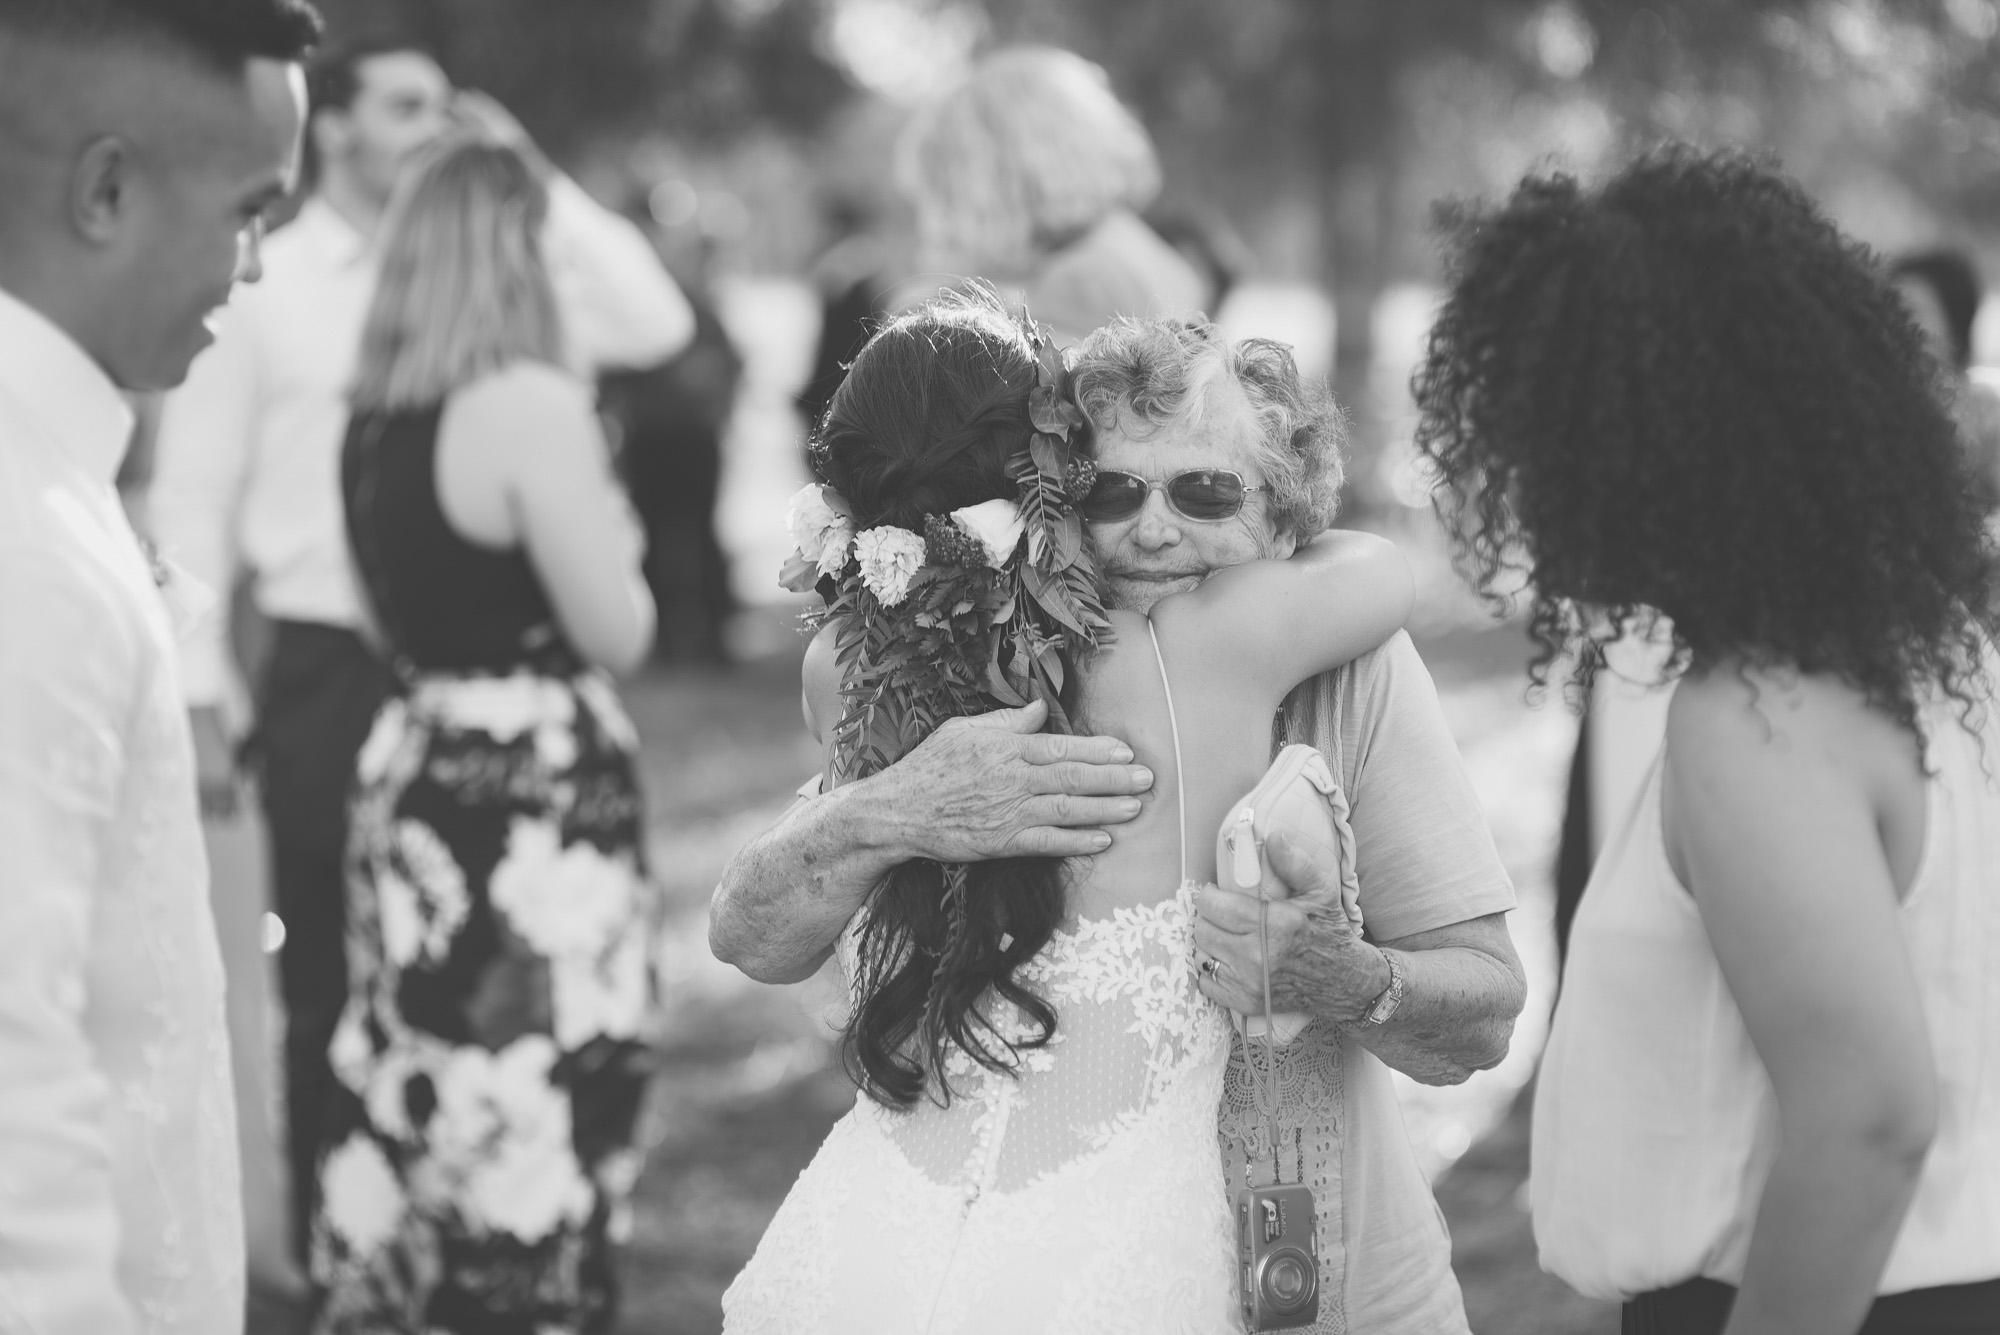 wedding-photographer-outdoor-casual-styled-los-angeles-australia-california-international-earthbound -52.jpg